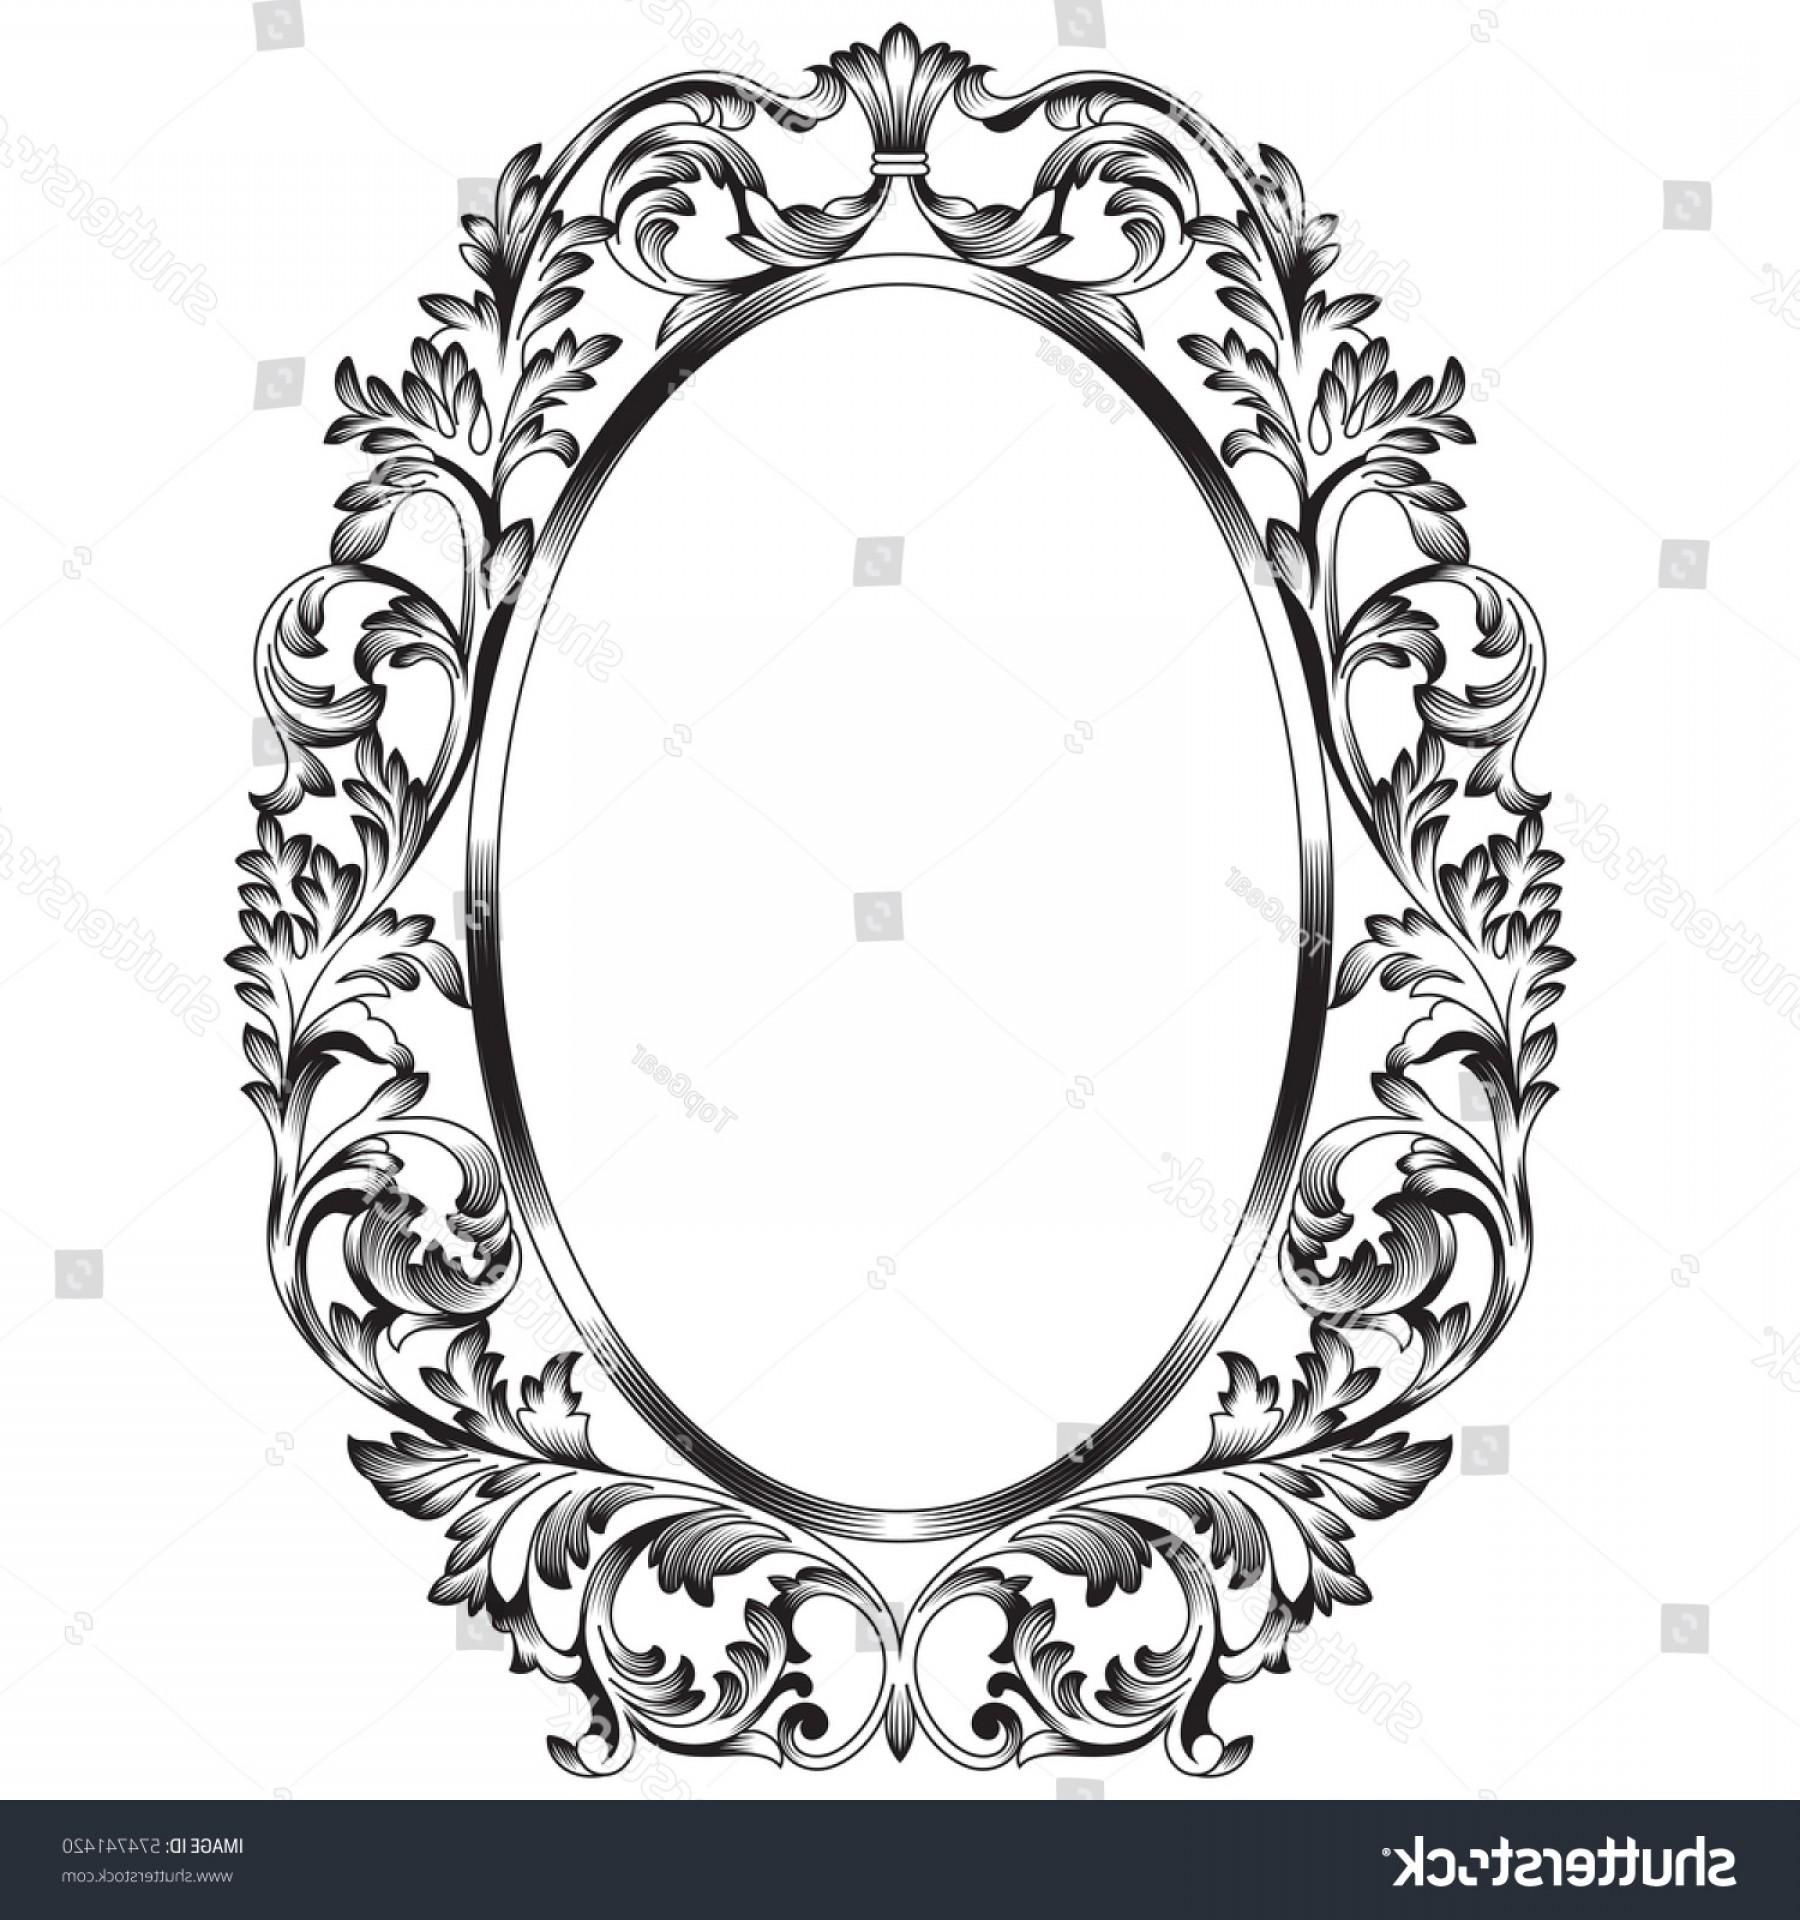 1800x1920 Oval Vintage Border Frame Engraving Retro Lazttweet